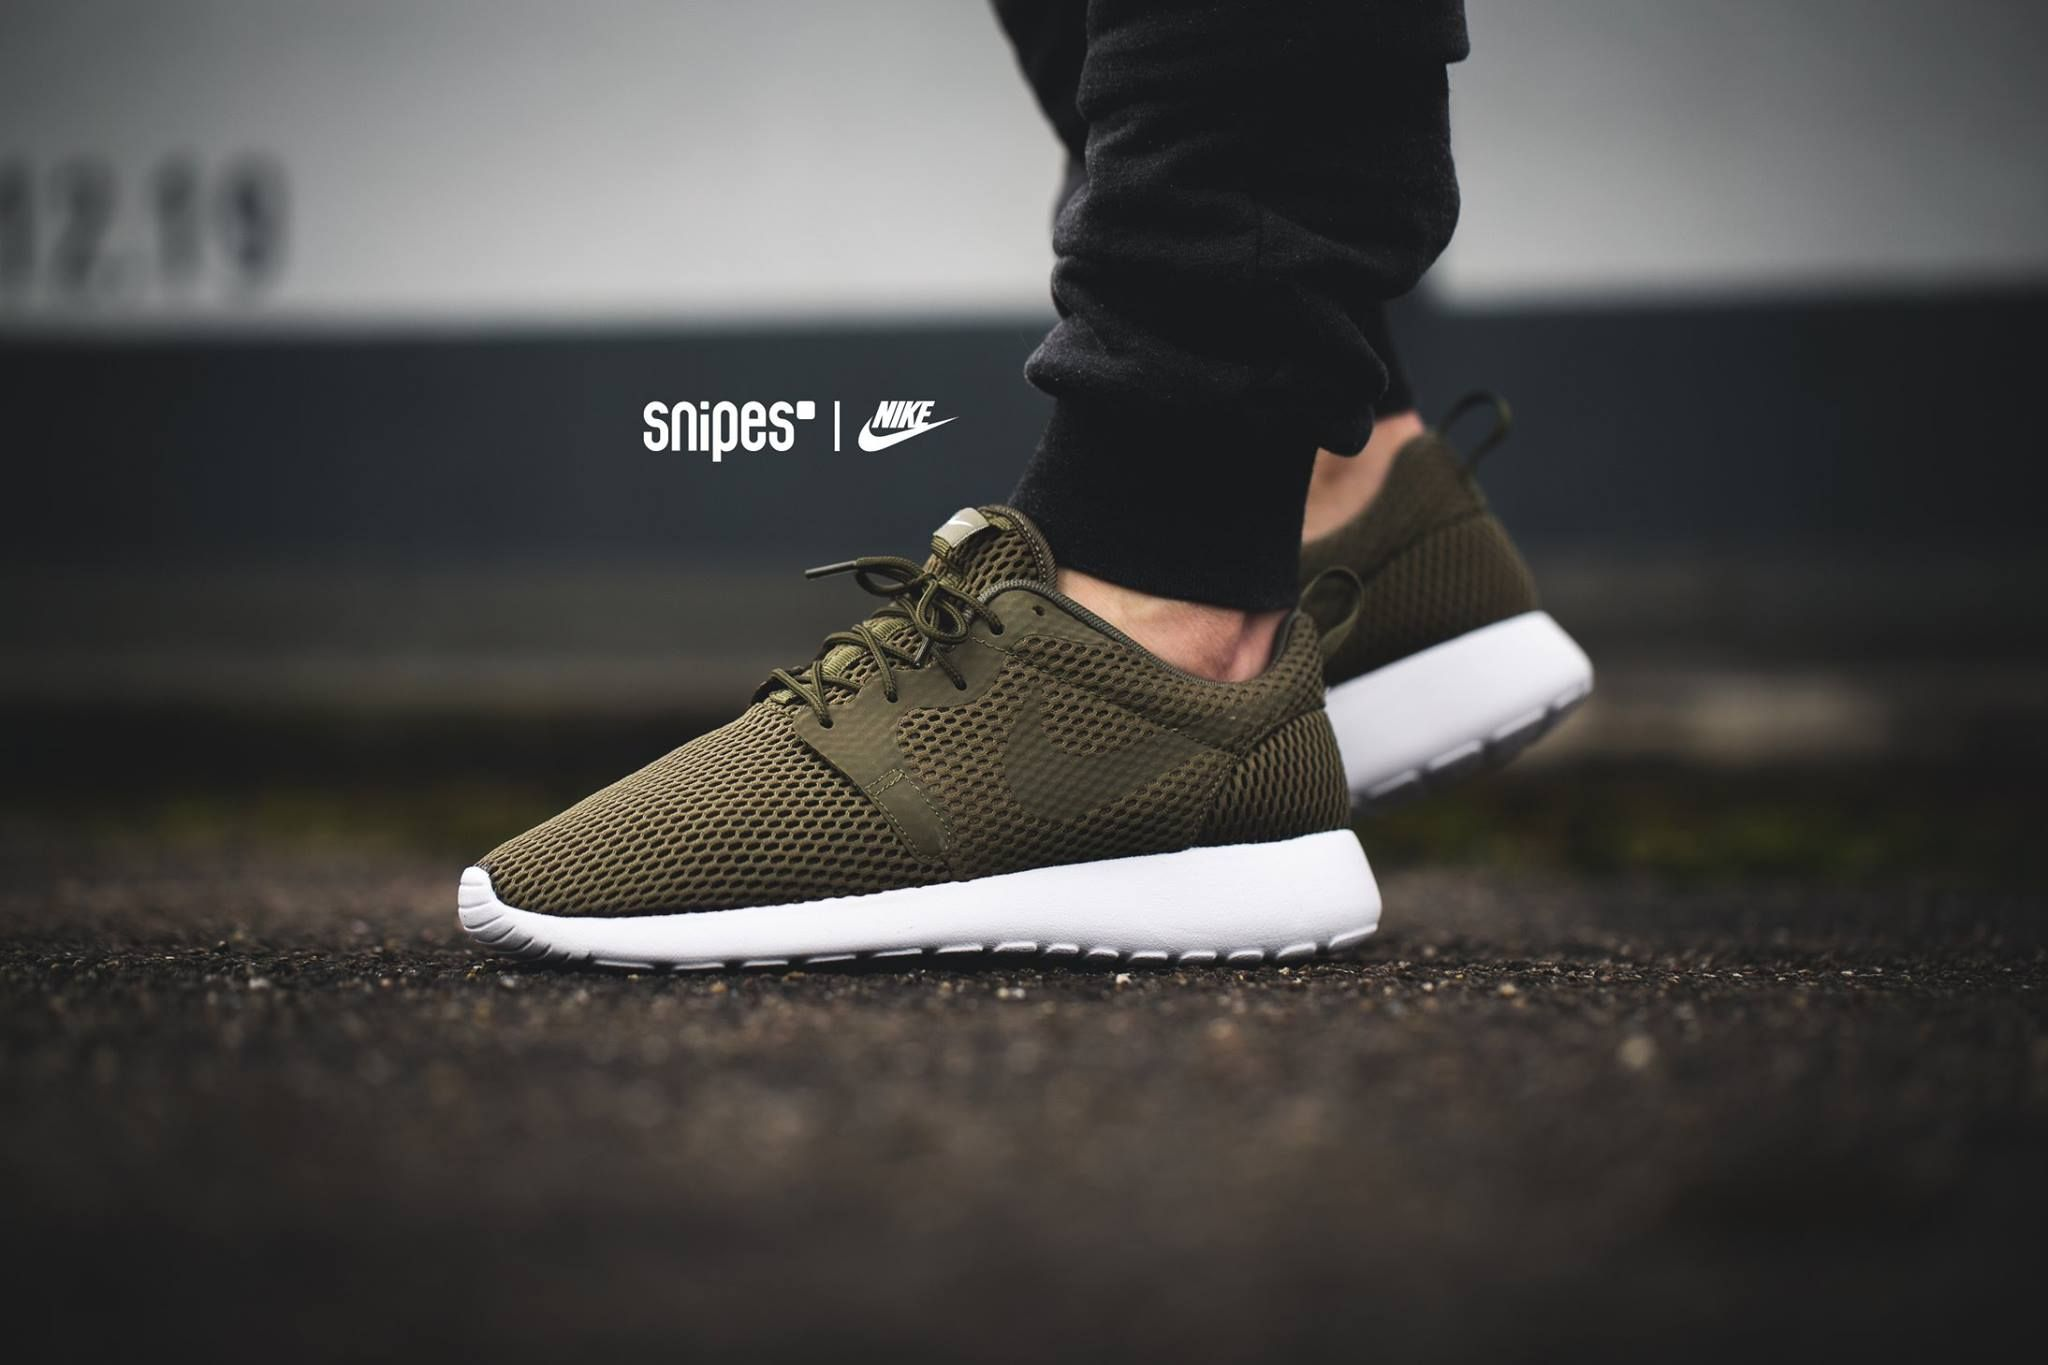 Bequem Nike Air Force 1 Niedrig Supreme Herren Maizeschwarzanthrazit Schuhe